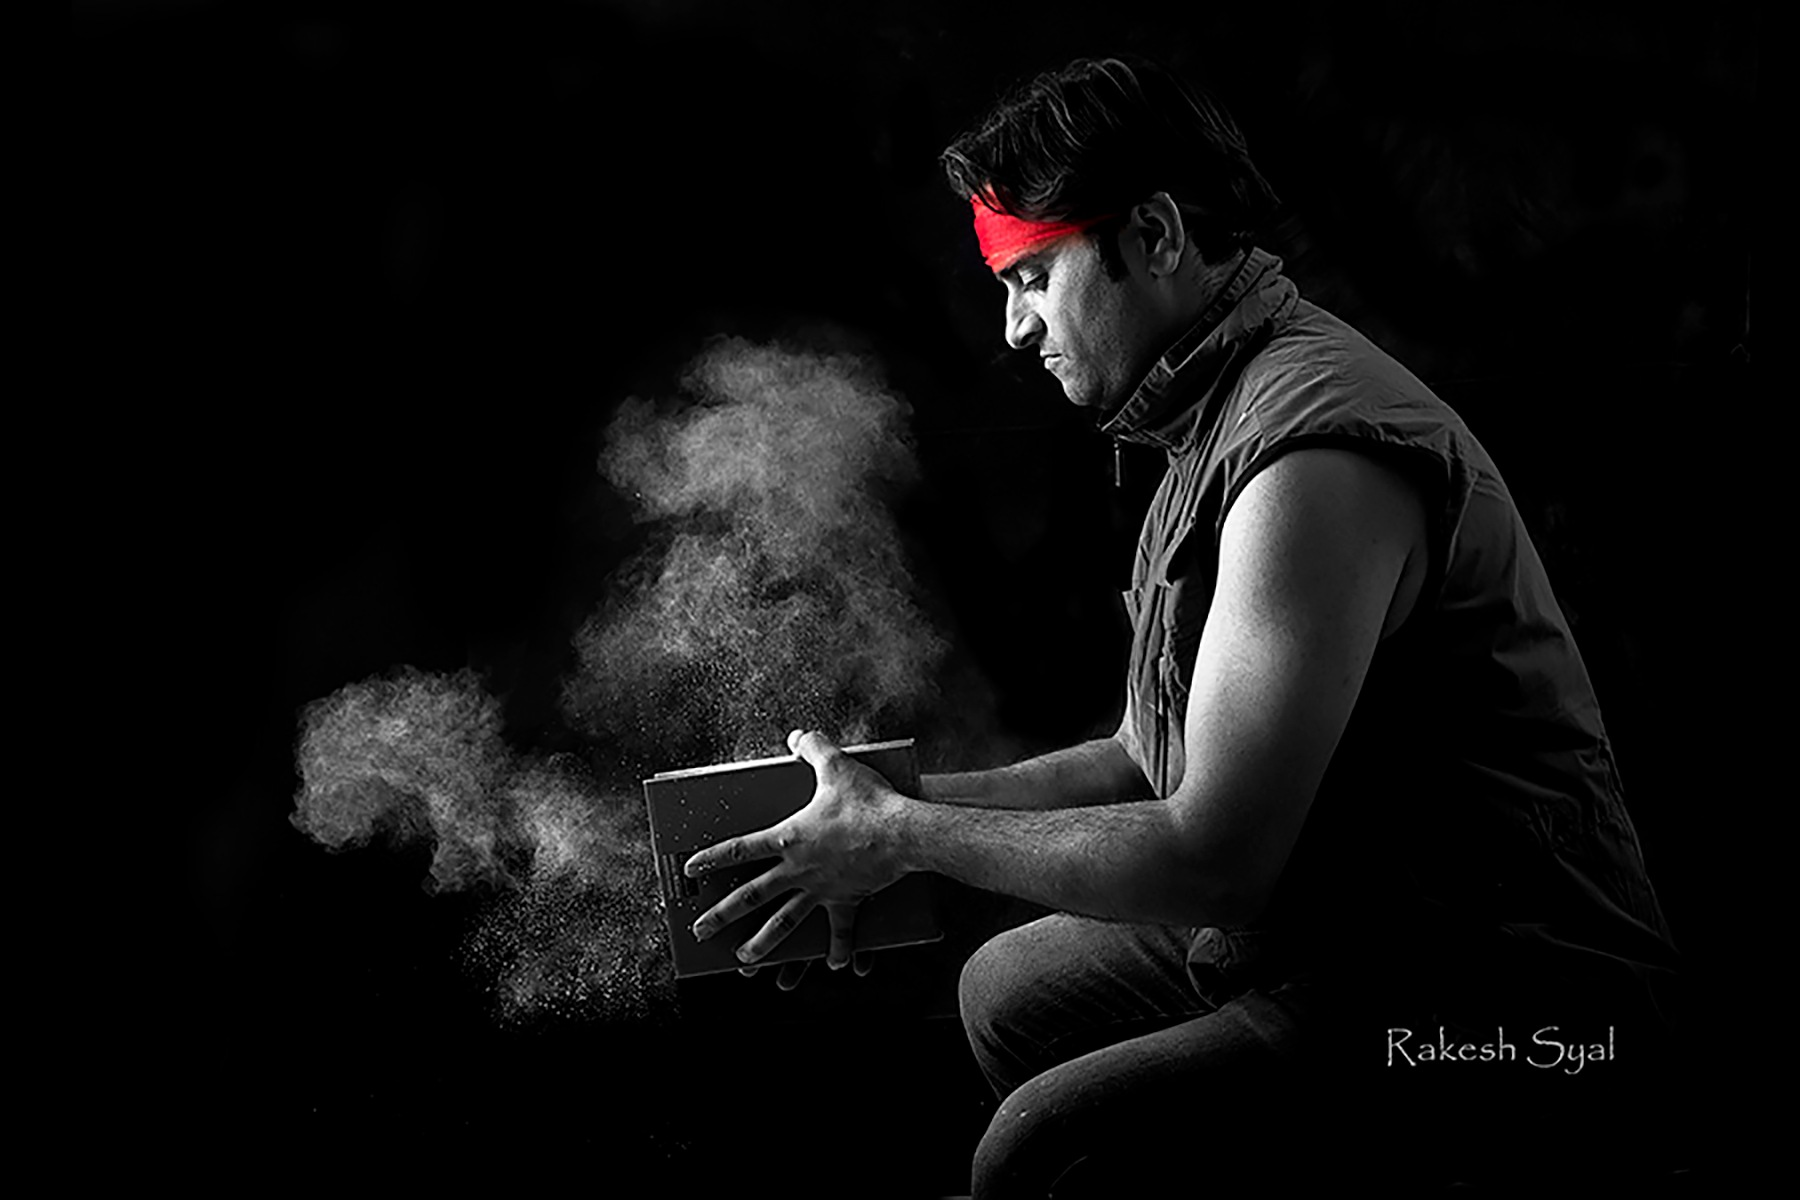 FORCE 10 by Rakesh Syal